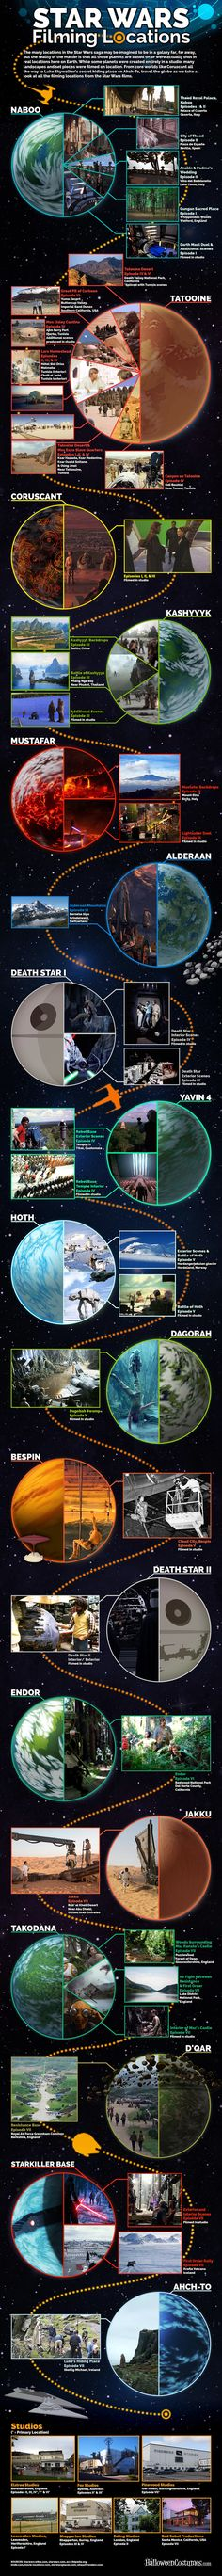 Star Wars Filming Locations Movie infographic #travel #film #geek